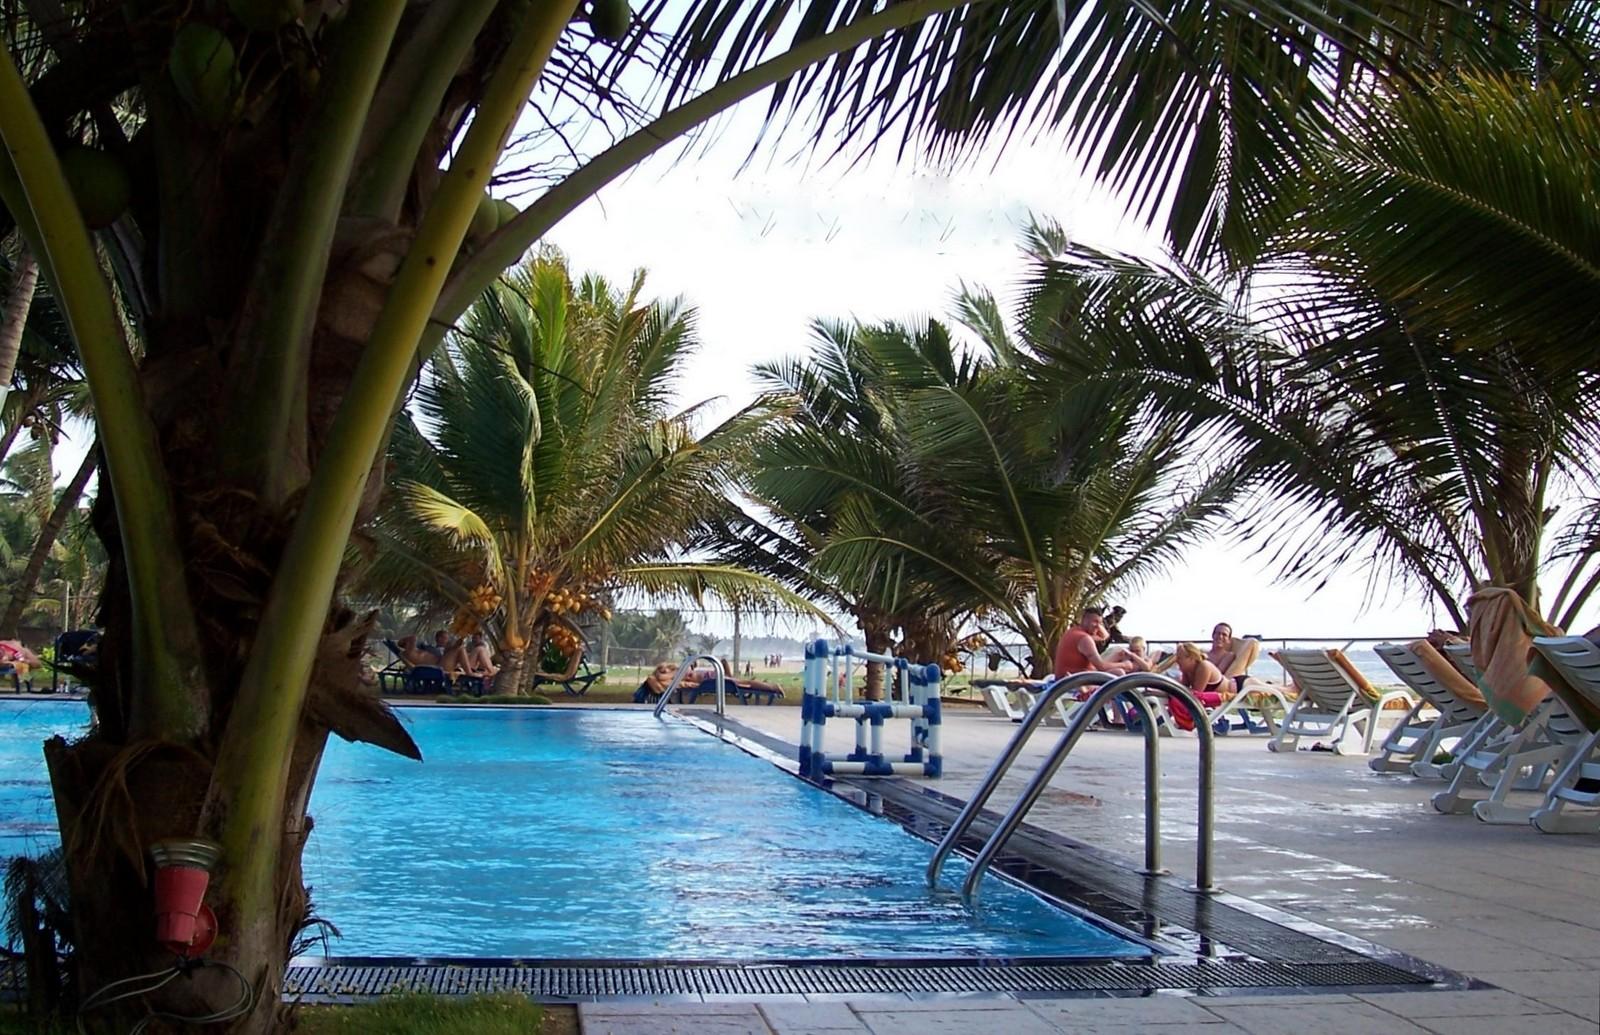 Hotel Camelot in Negombo - Ceylon